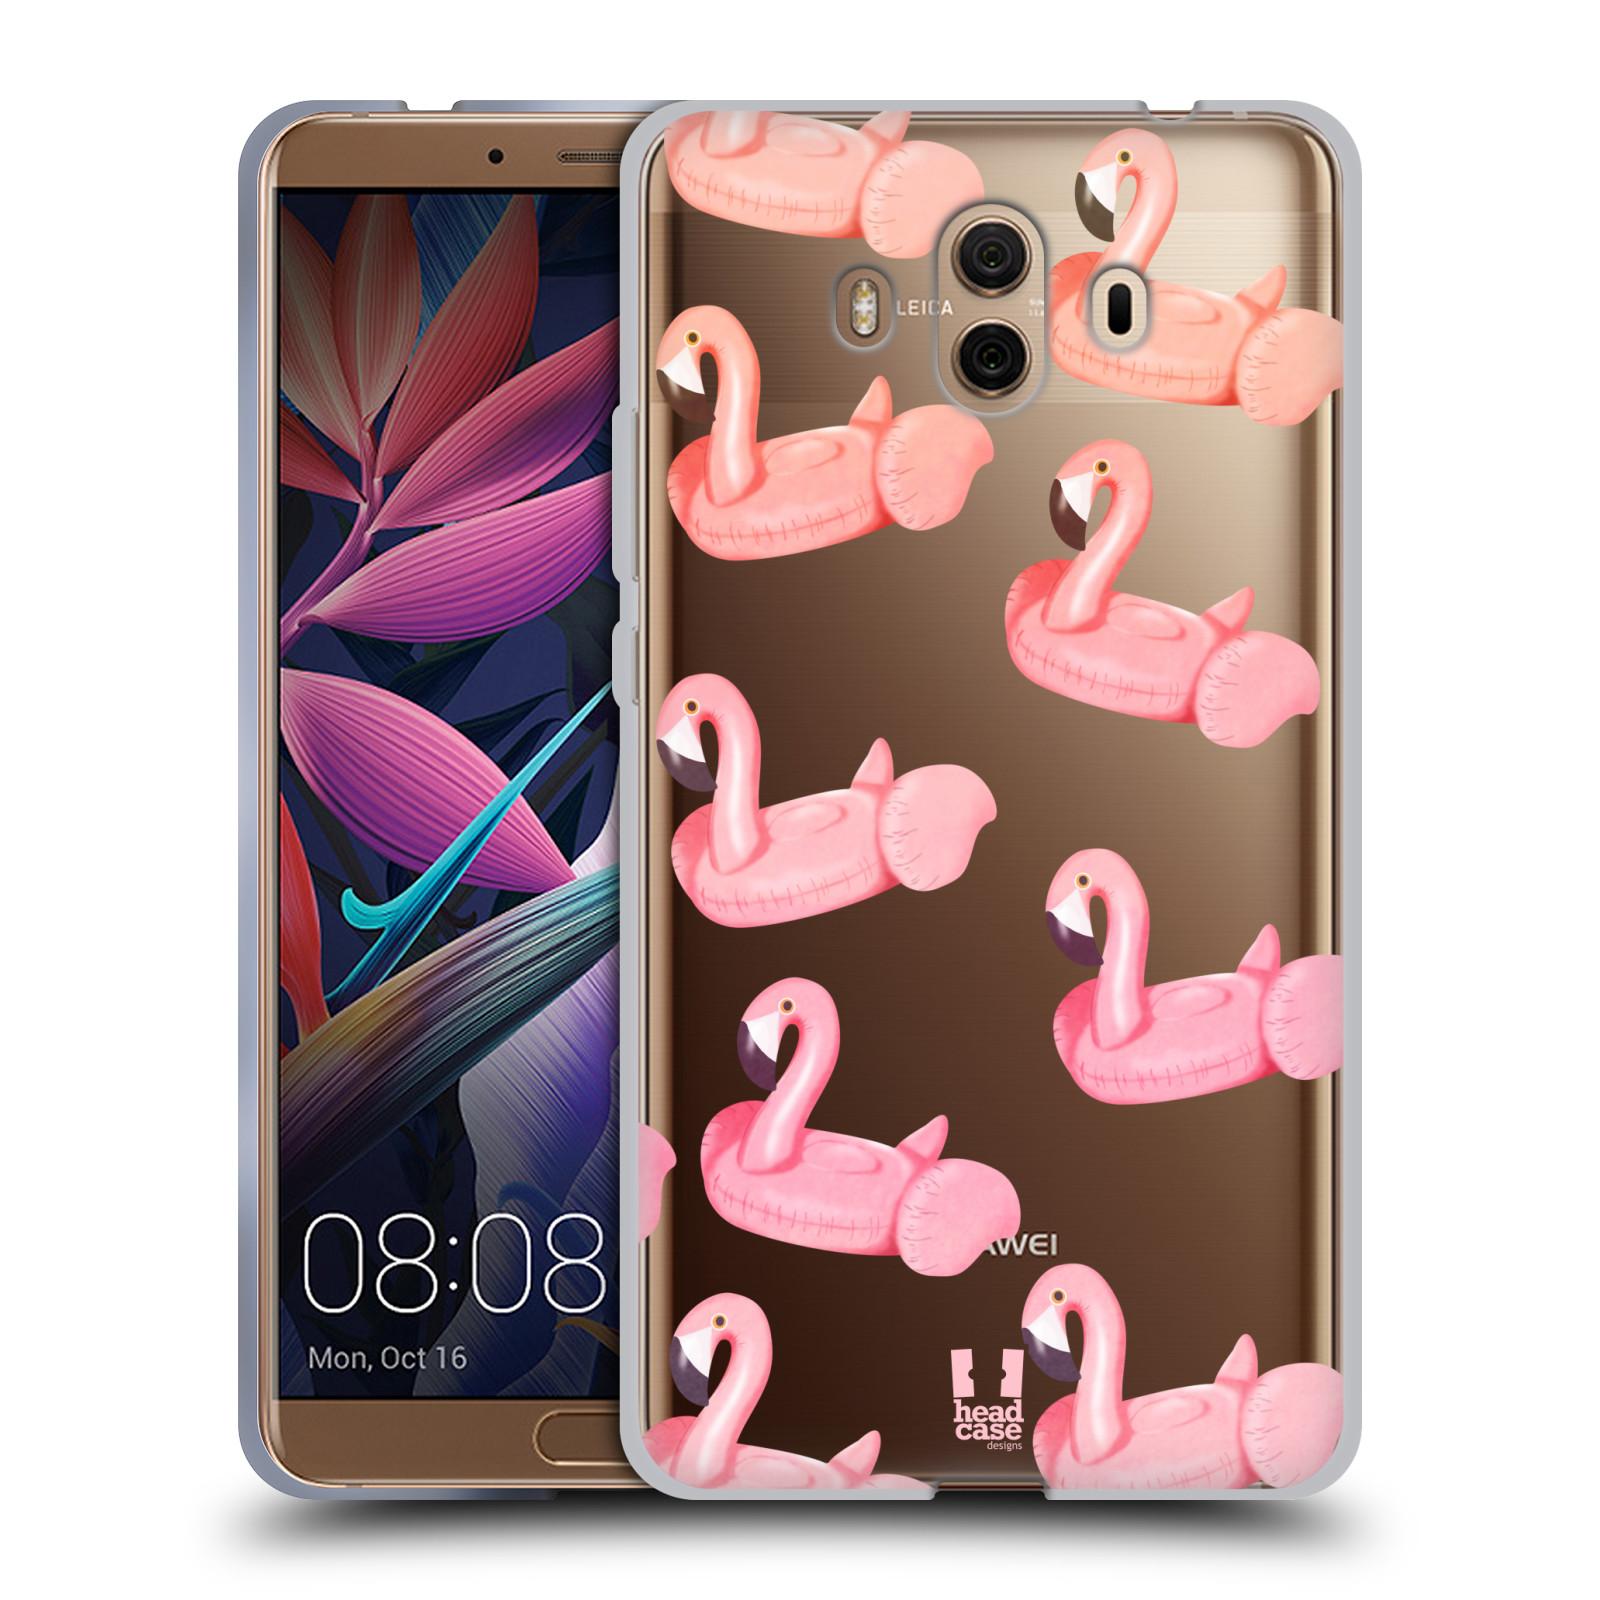 Silikonové pouzdro na mobil Huawei Mate 10 - Head Case - Kruh plaměňák